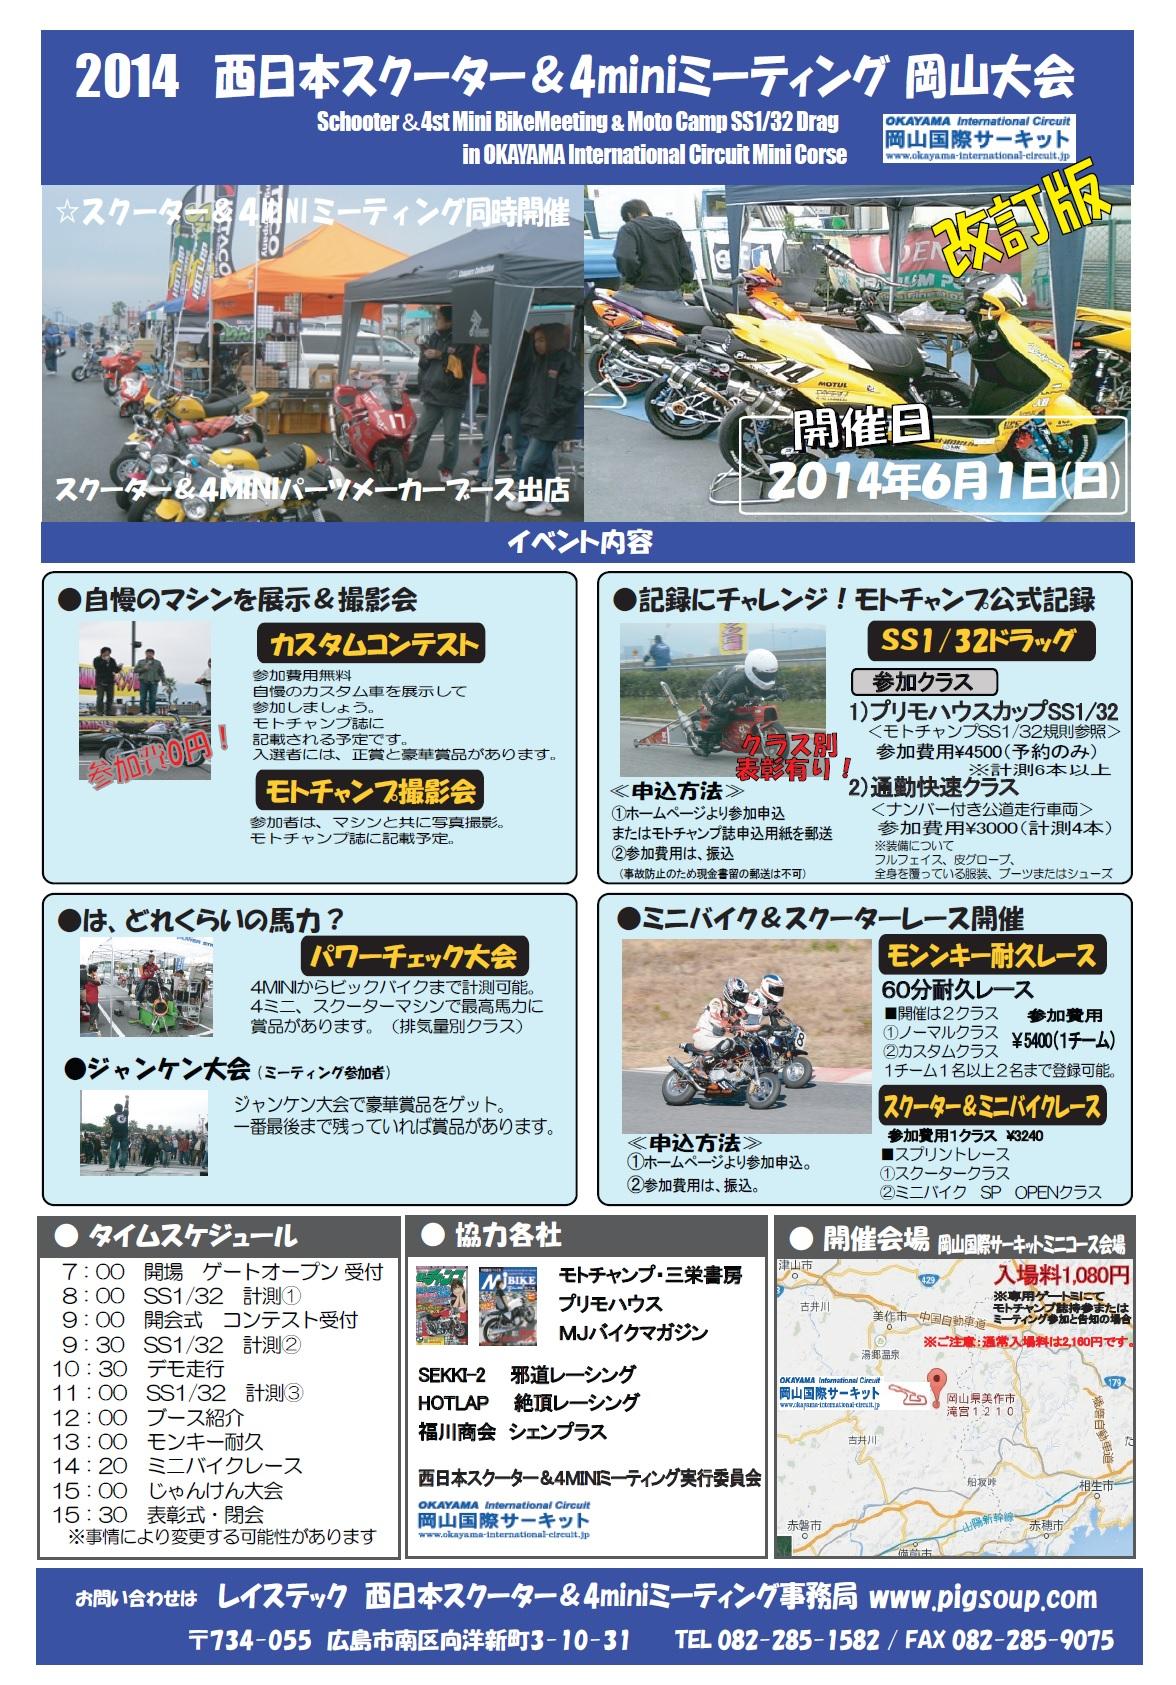 2014_SC4mini_0601_1.jpg